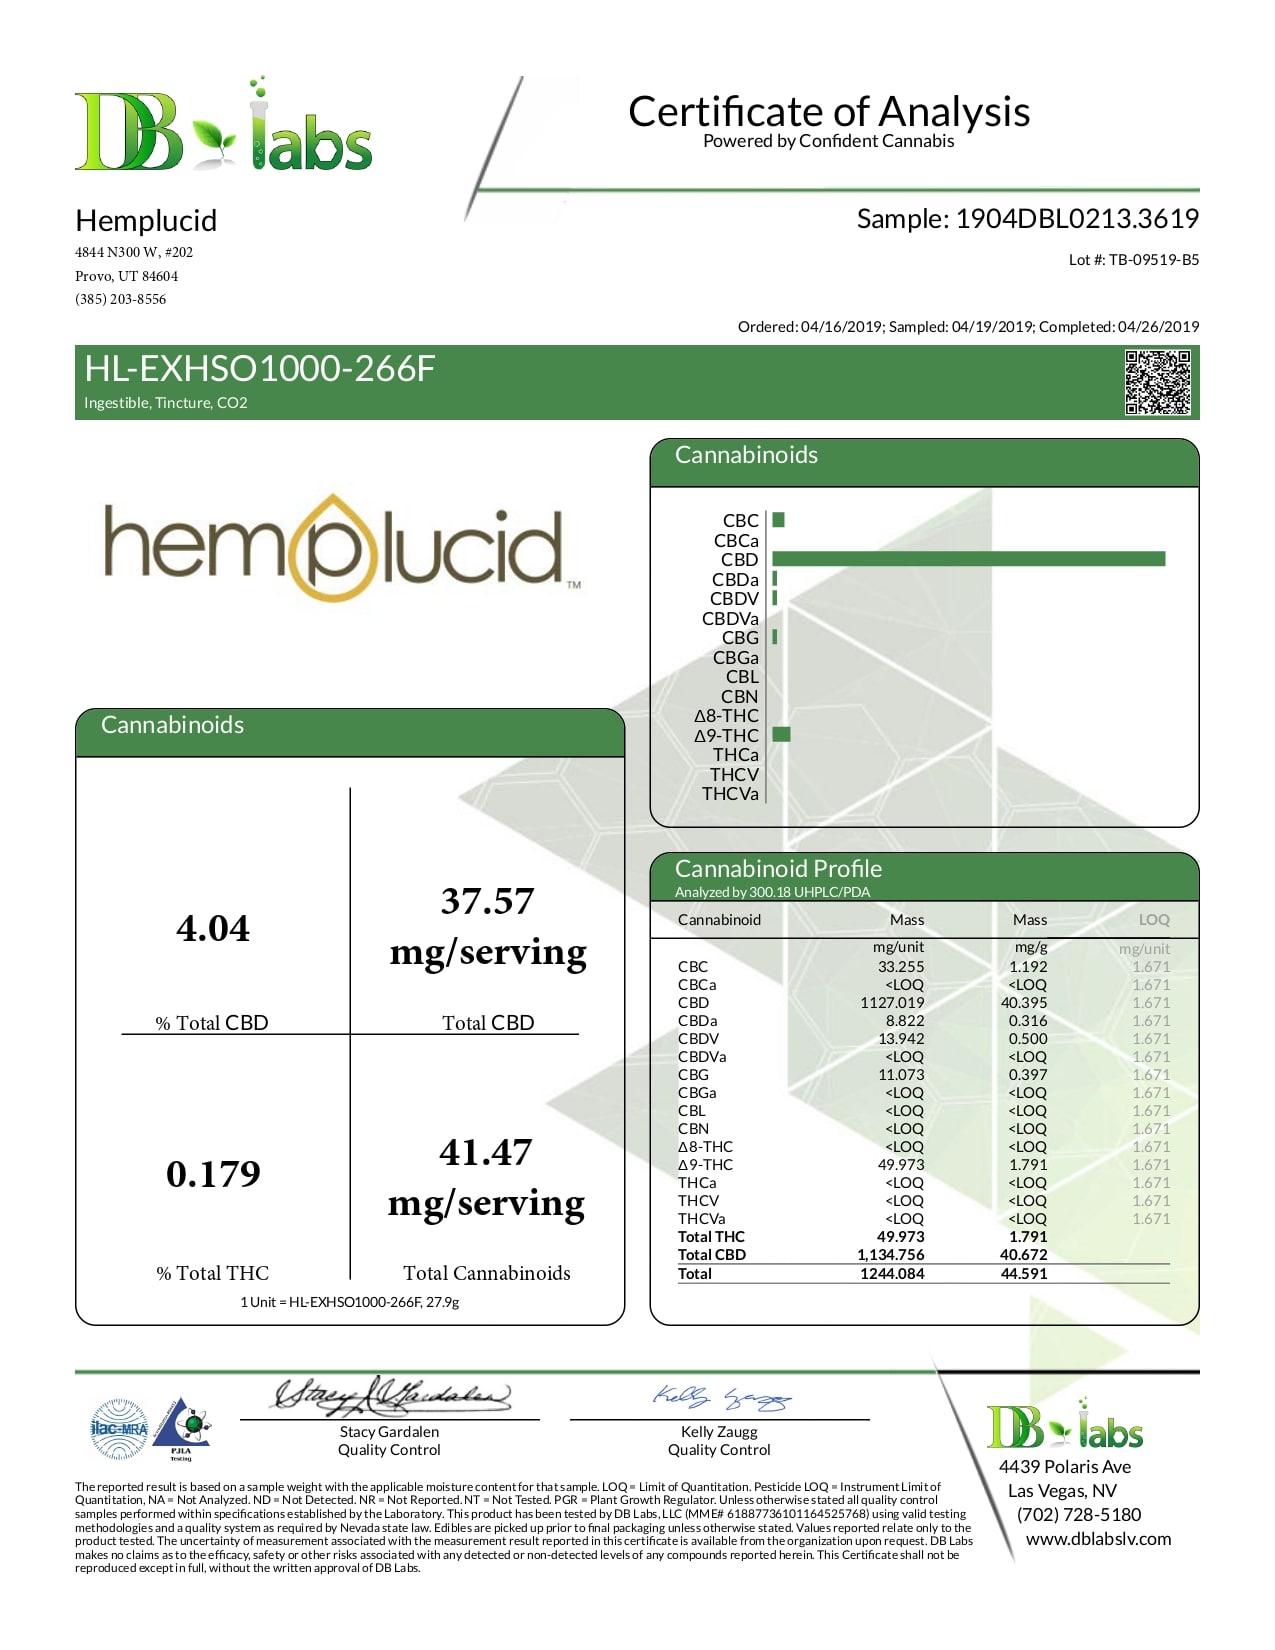 Hemplucid Full Spectrum CBD Hemp Seed Oil 1000mg Lab Report